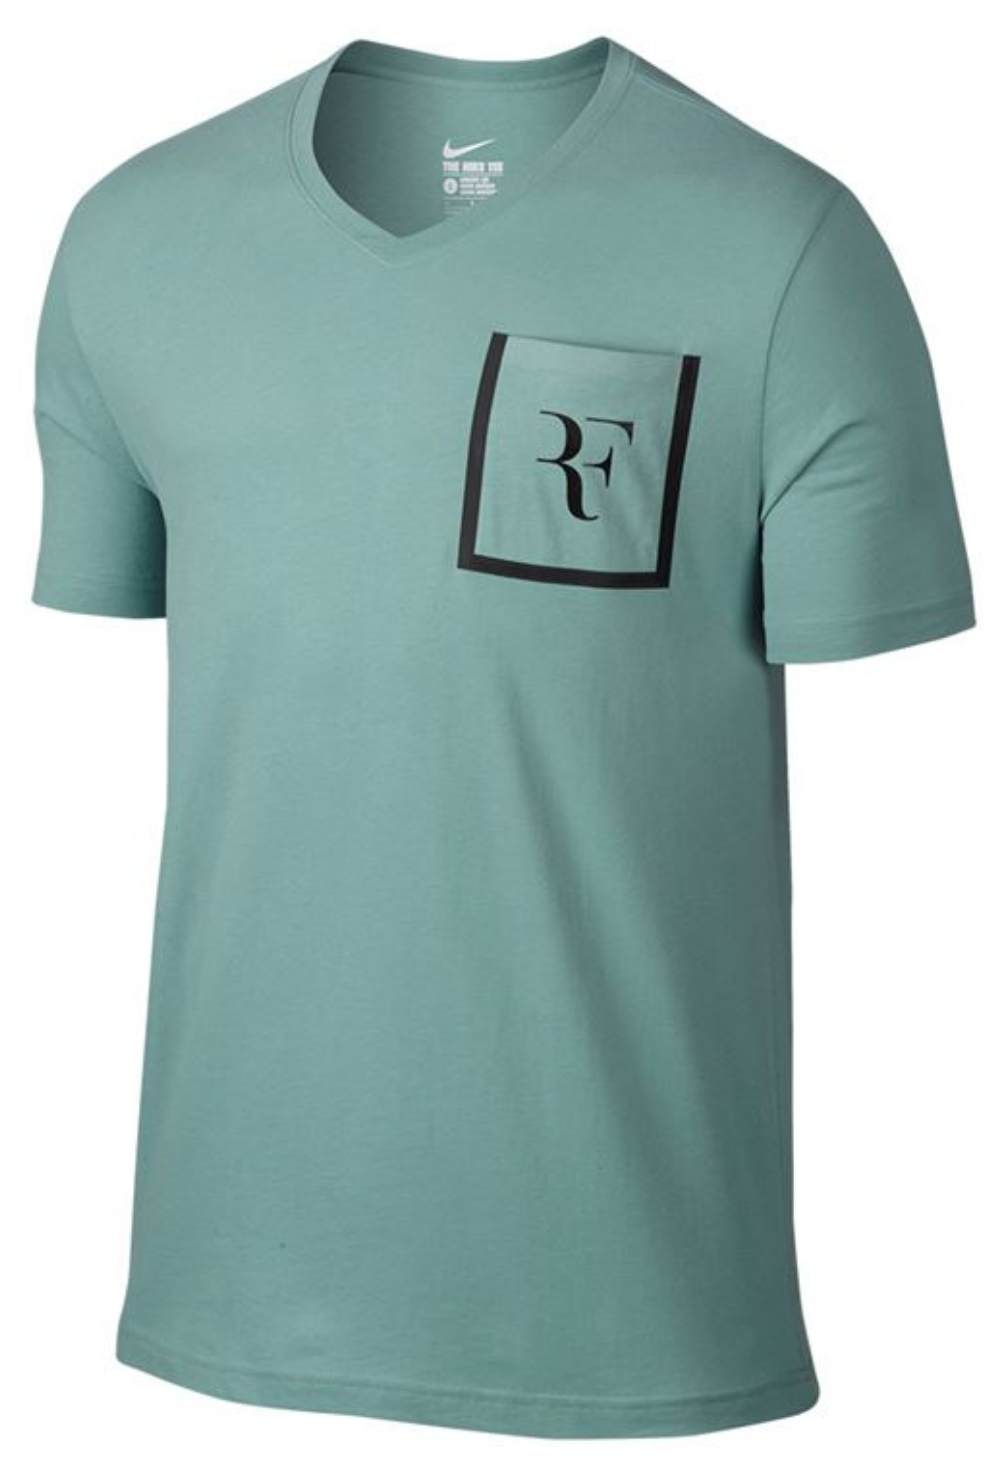 Roger Federer 2017 Hopman Cup RF Shirt